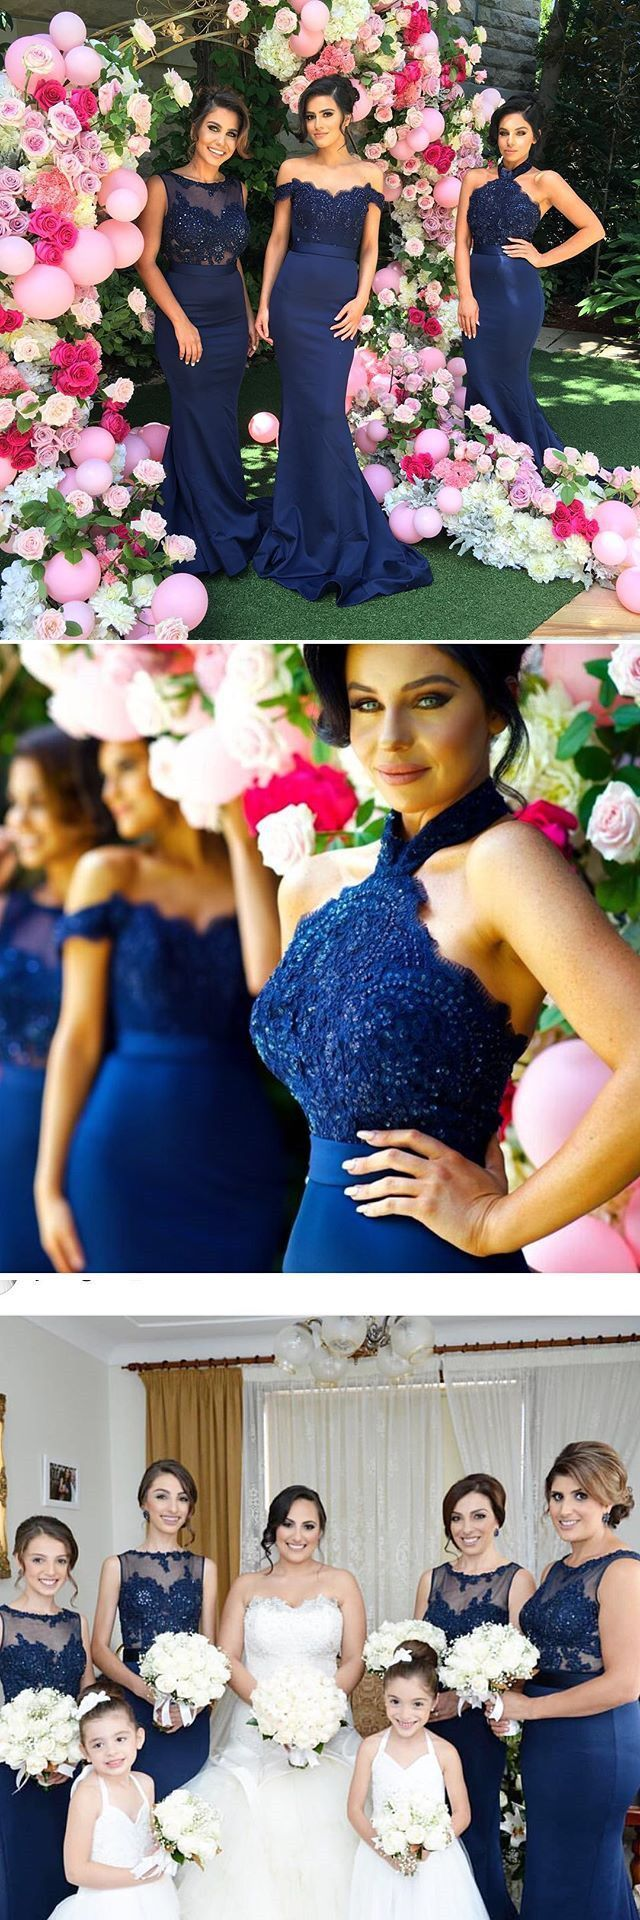 best bridesmaid dresses images on pinterest flower girls